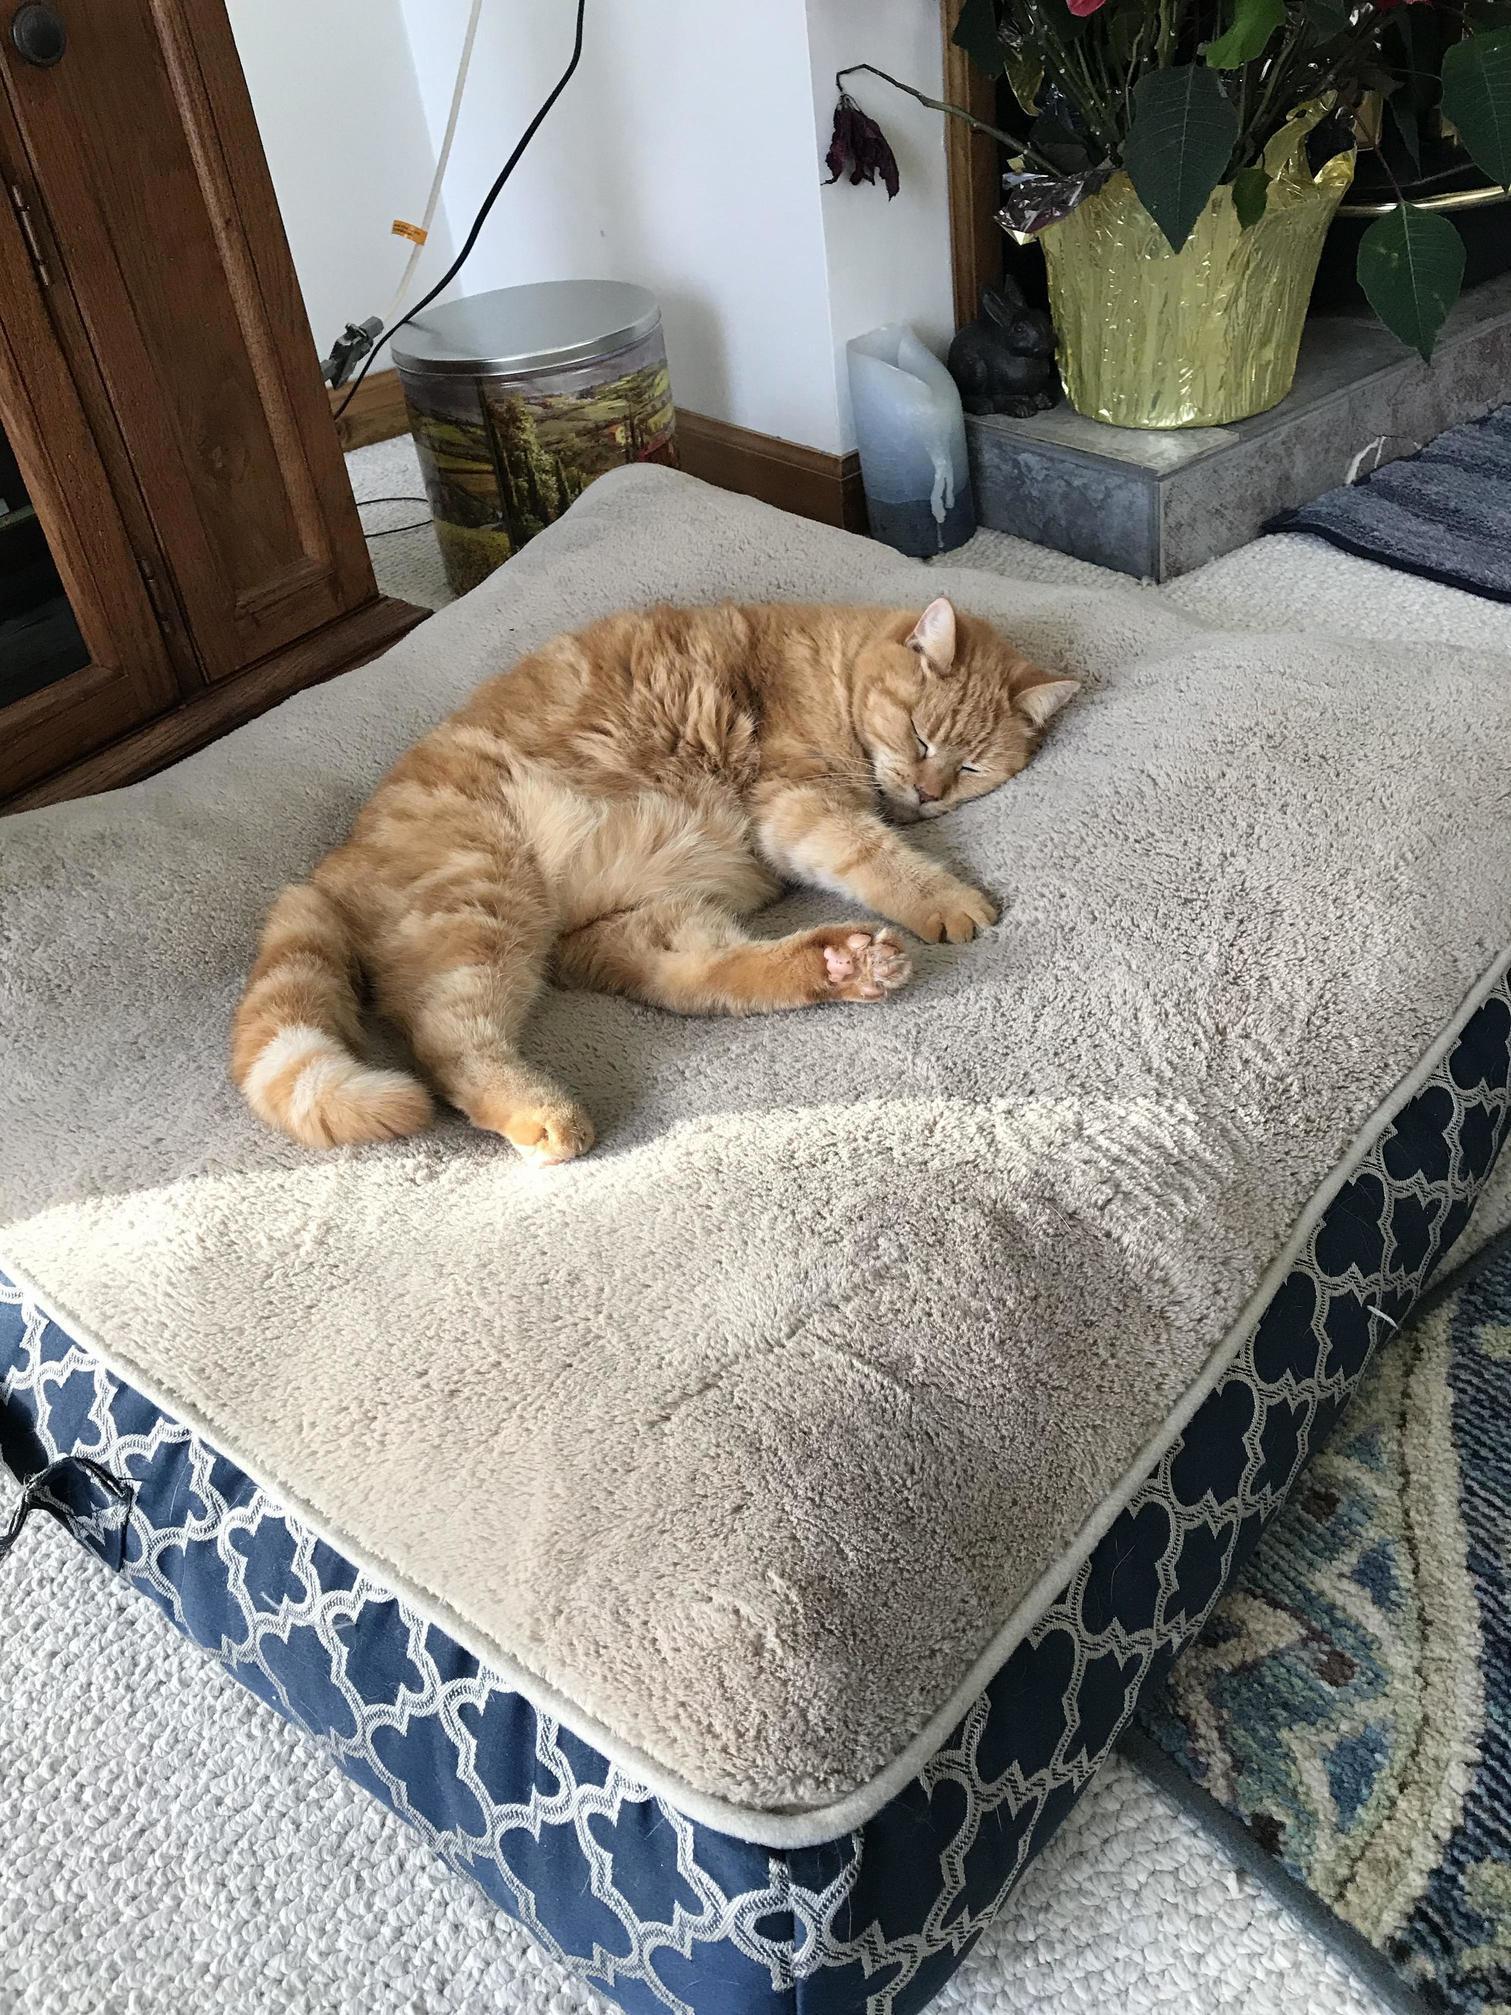 Sleeping on the dog bed lol